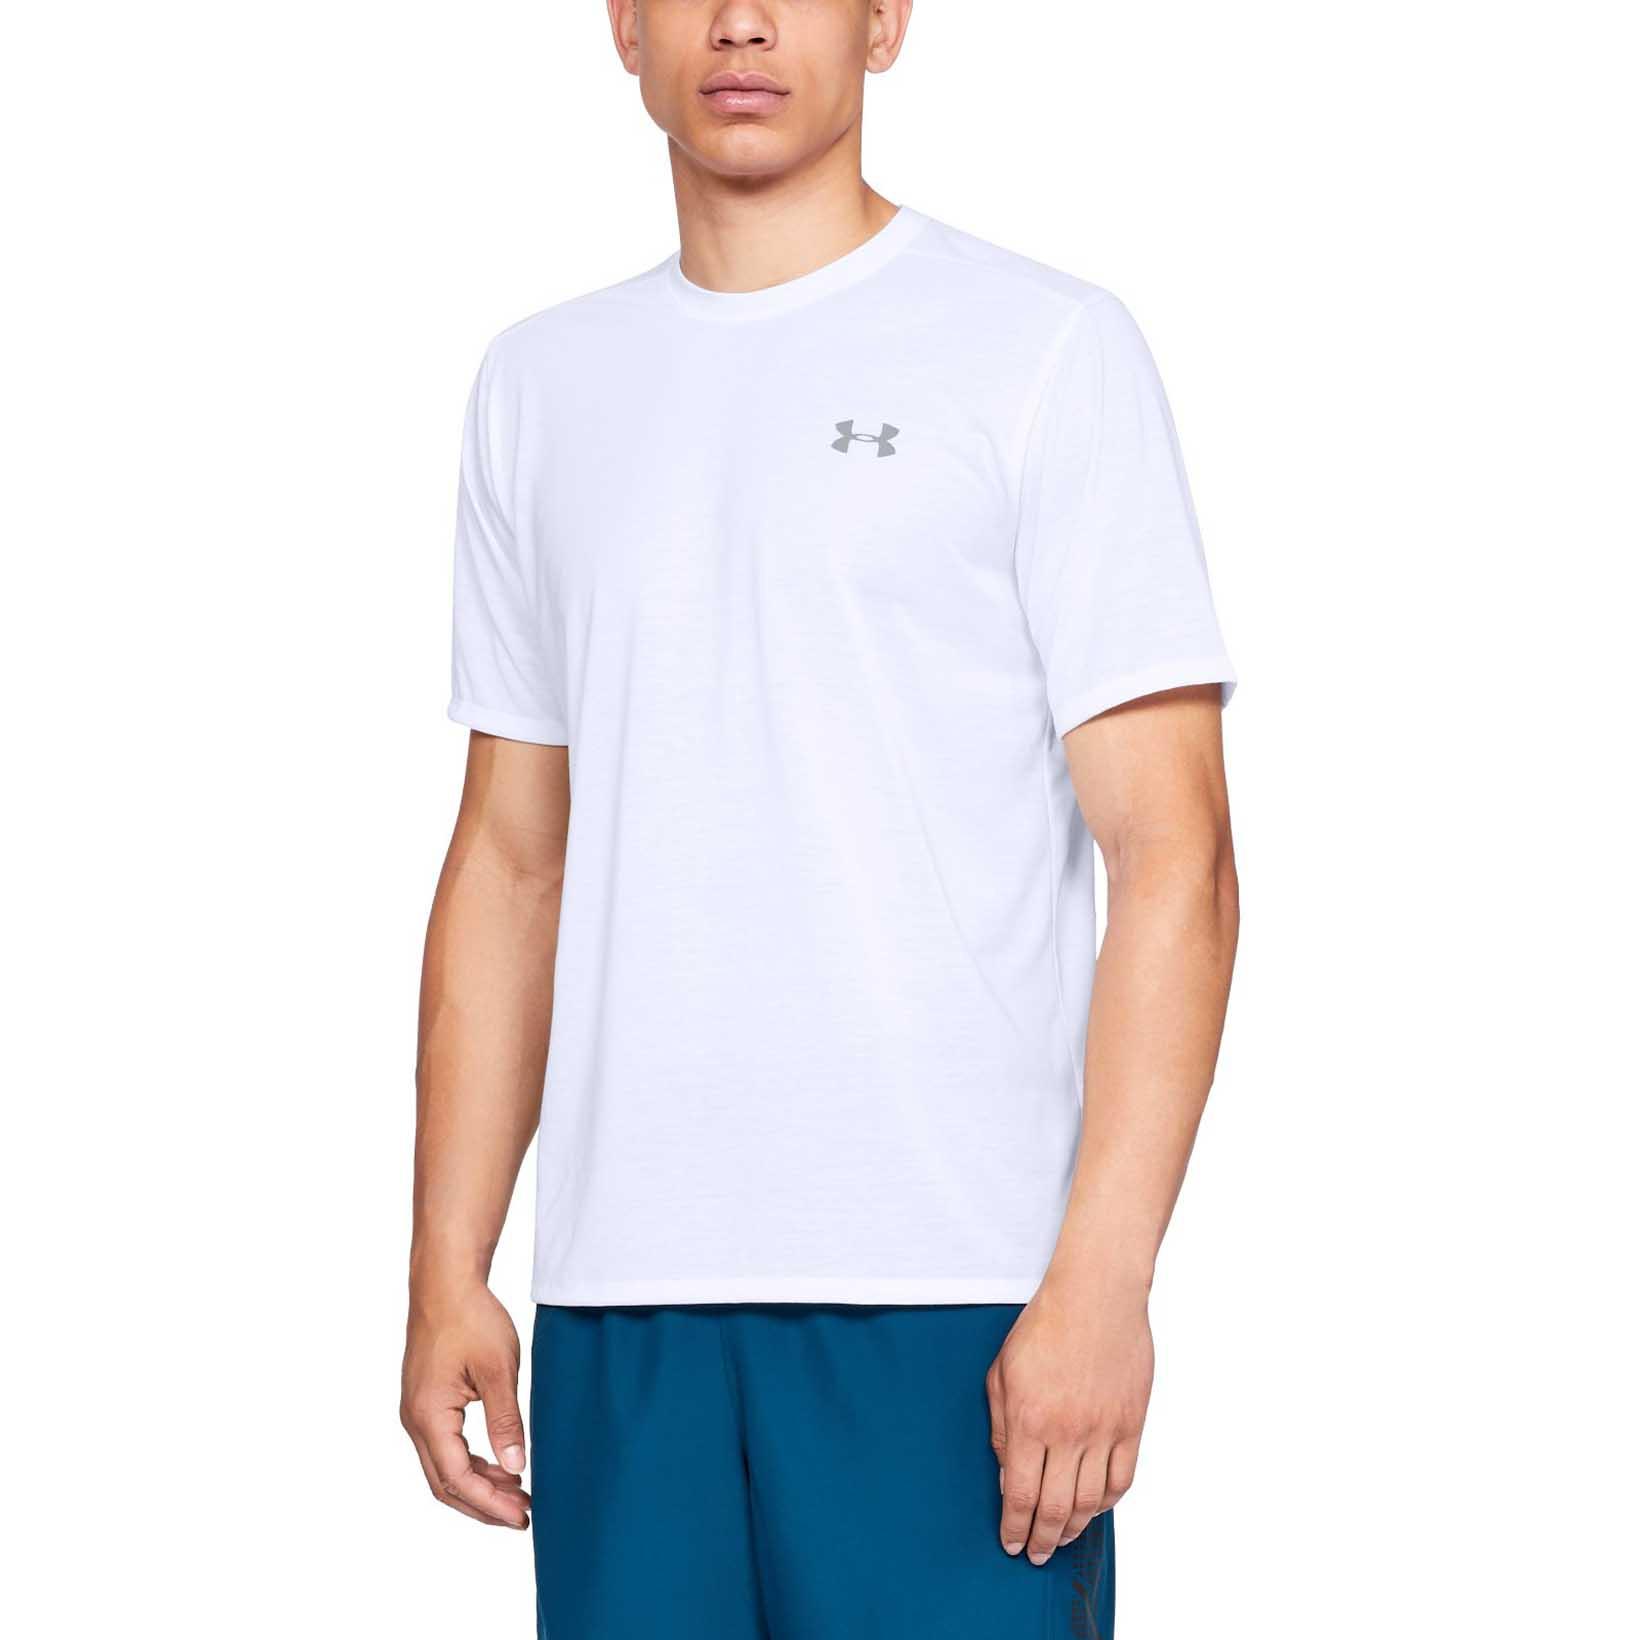 Мужская футболка Under Armour Siro SS 1325029-100